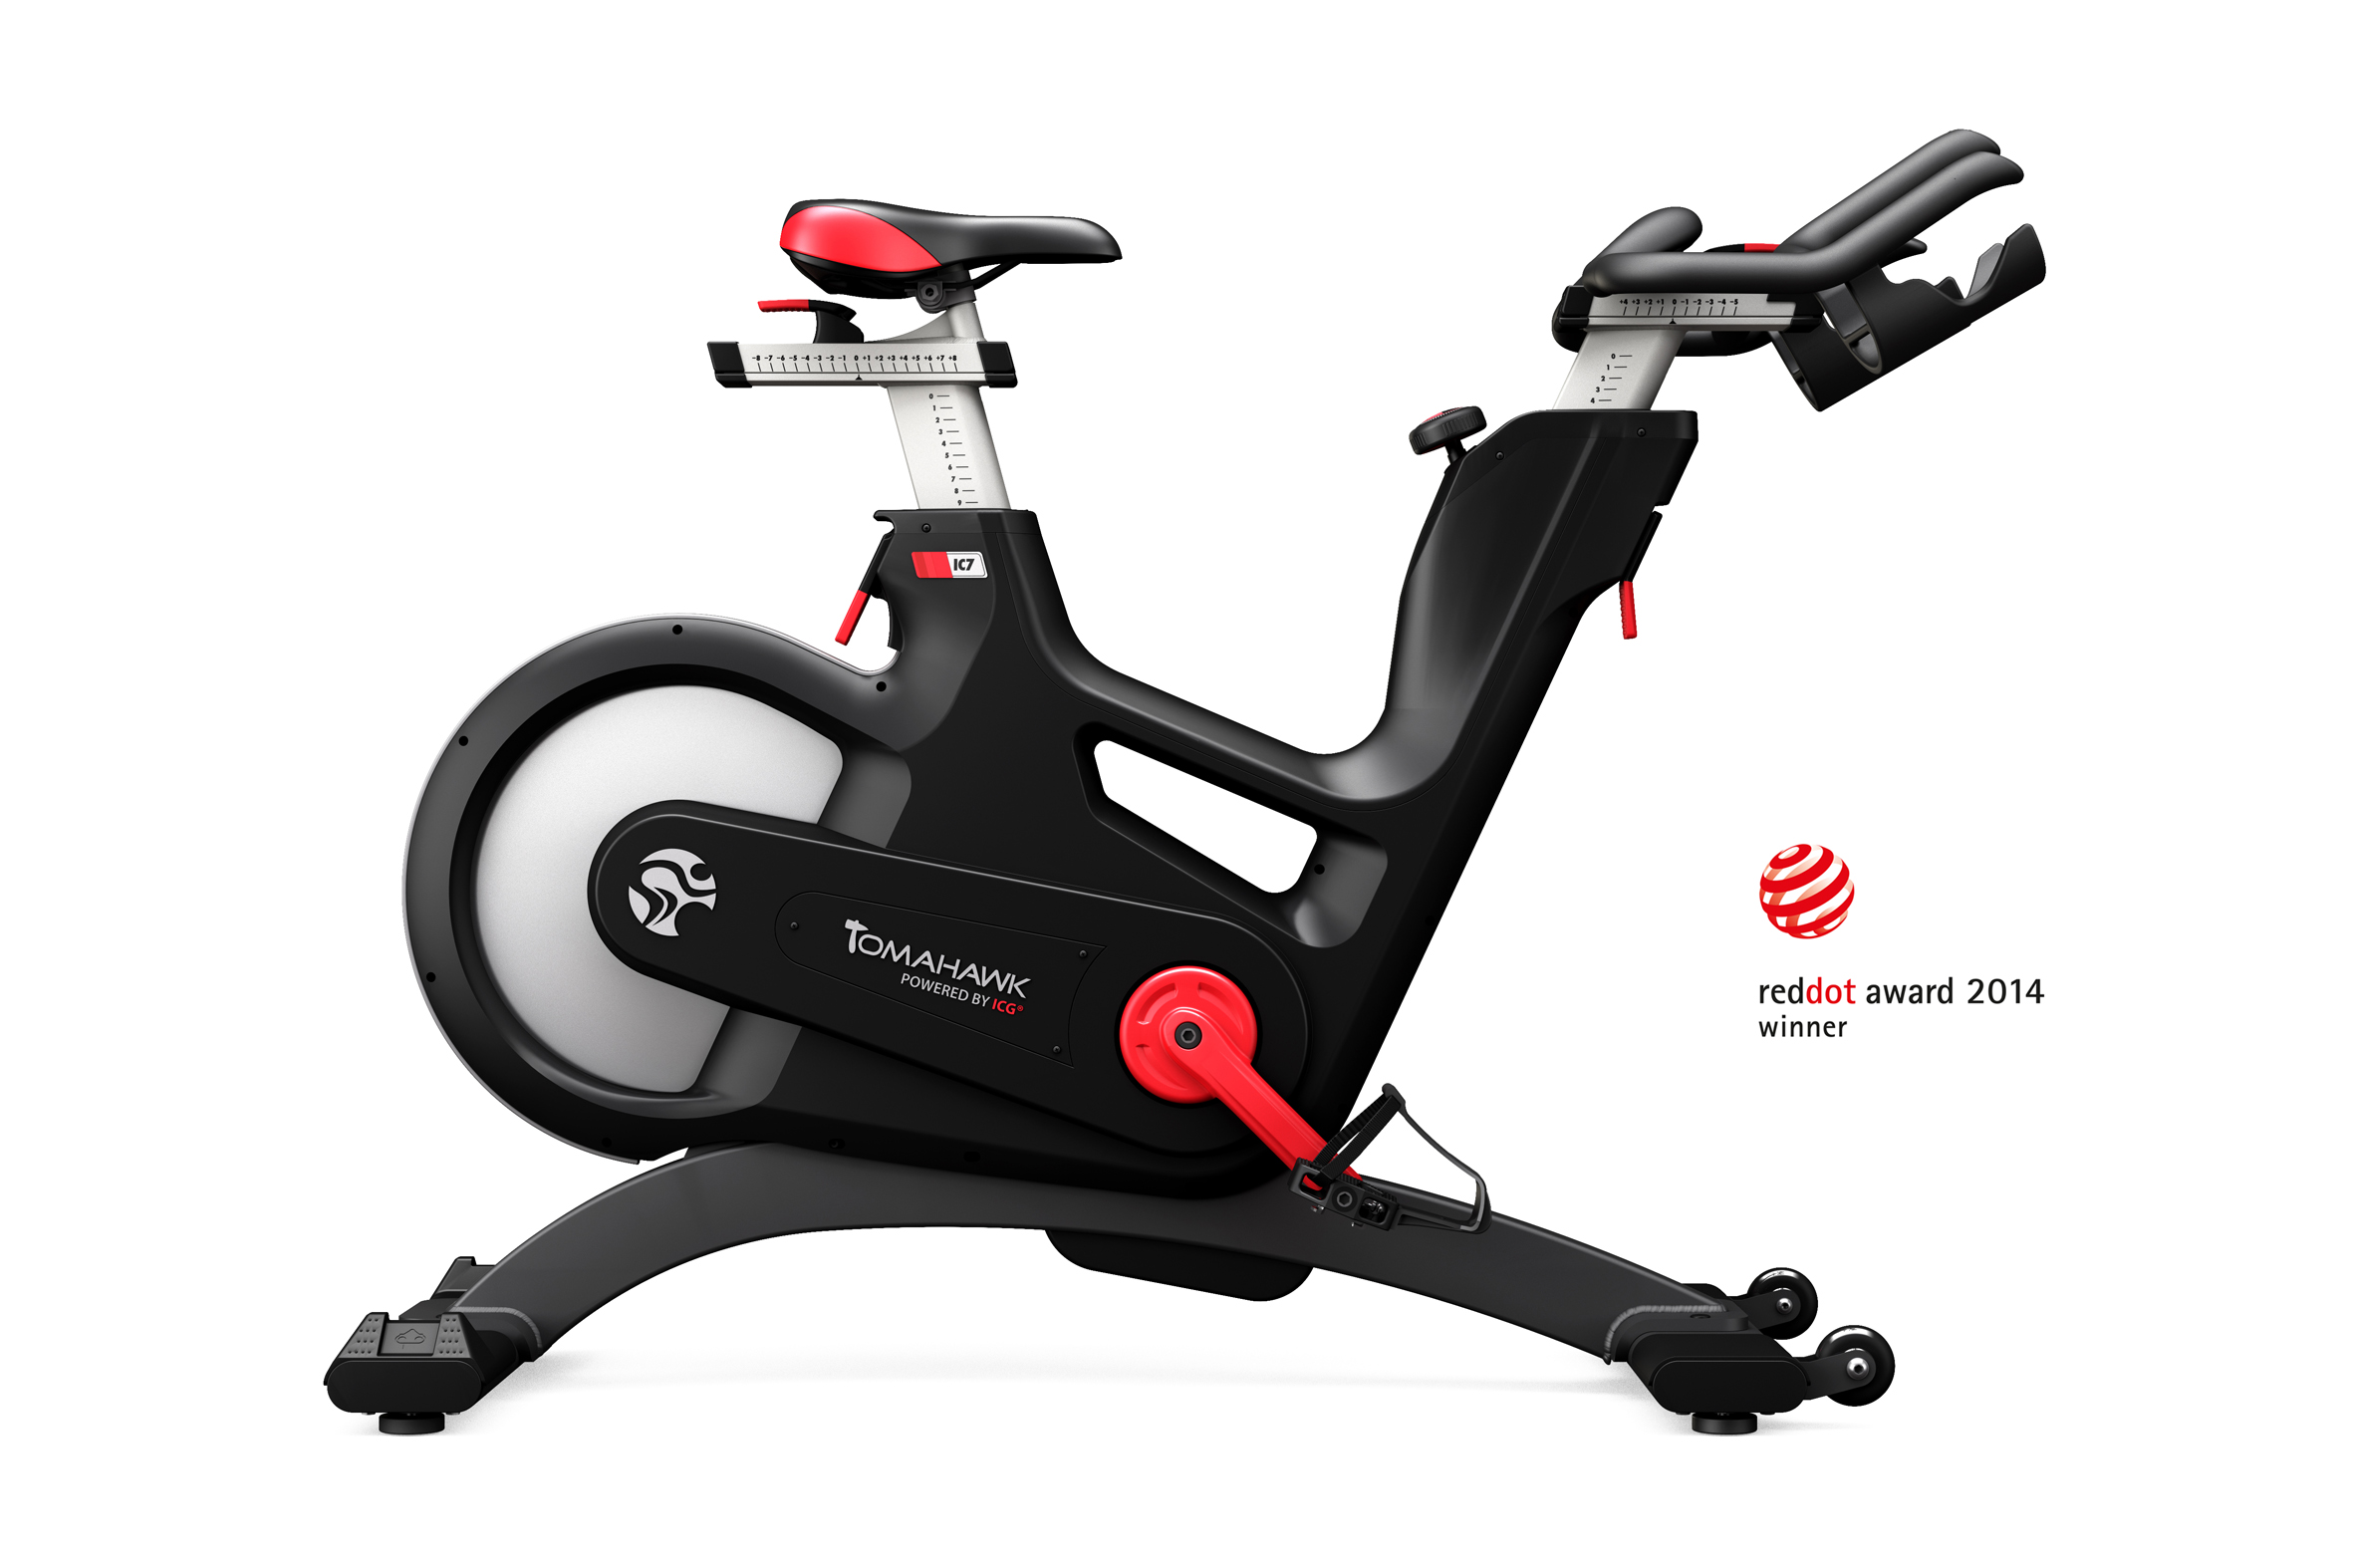 tritime-tested: Das Tomahawk Indoor-Bike IC7 - tritime ...